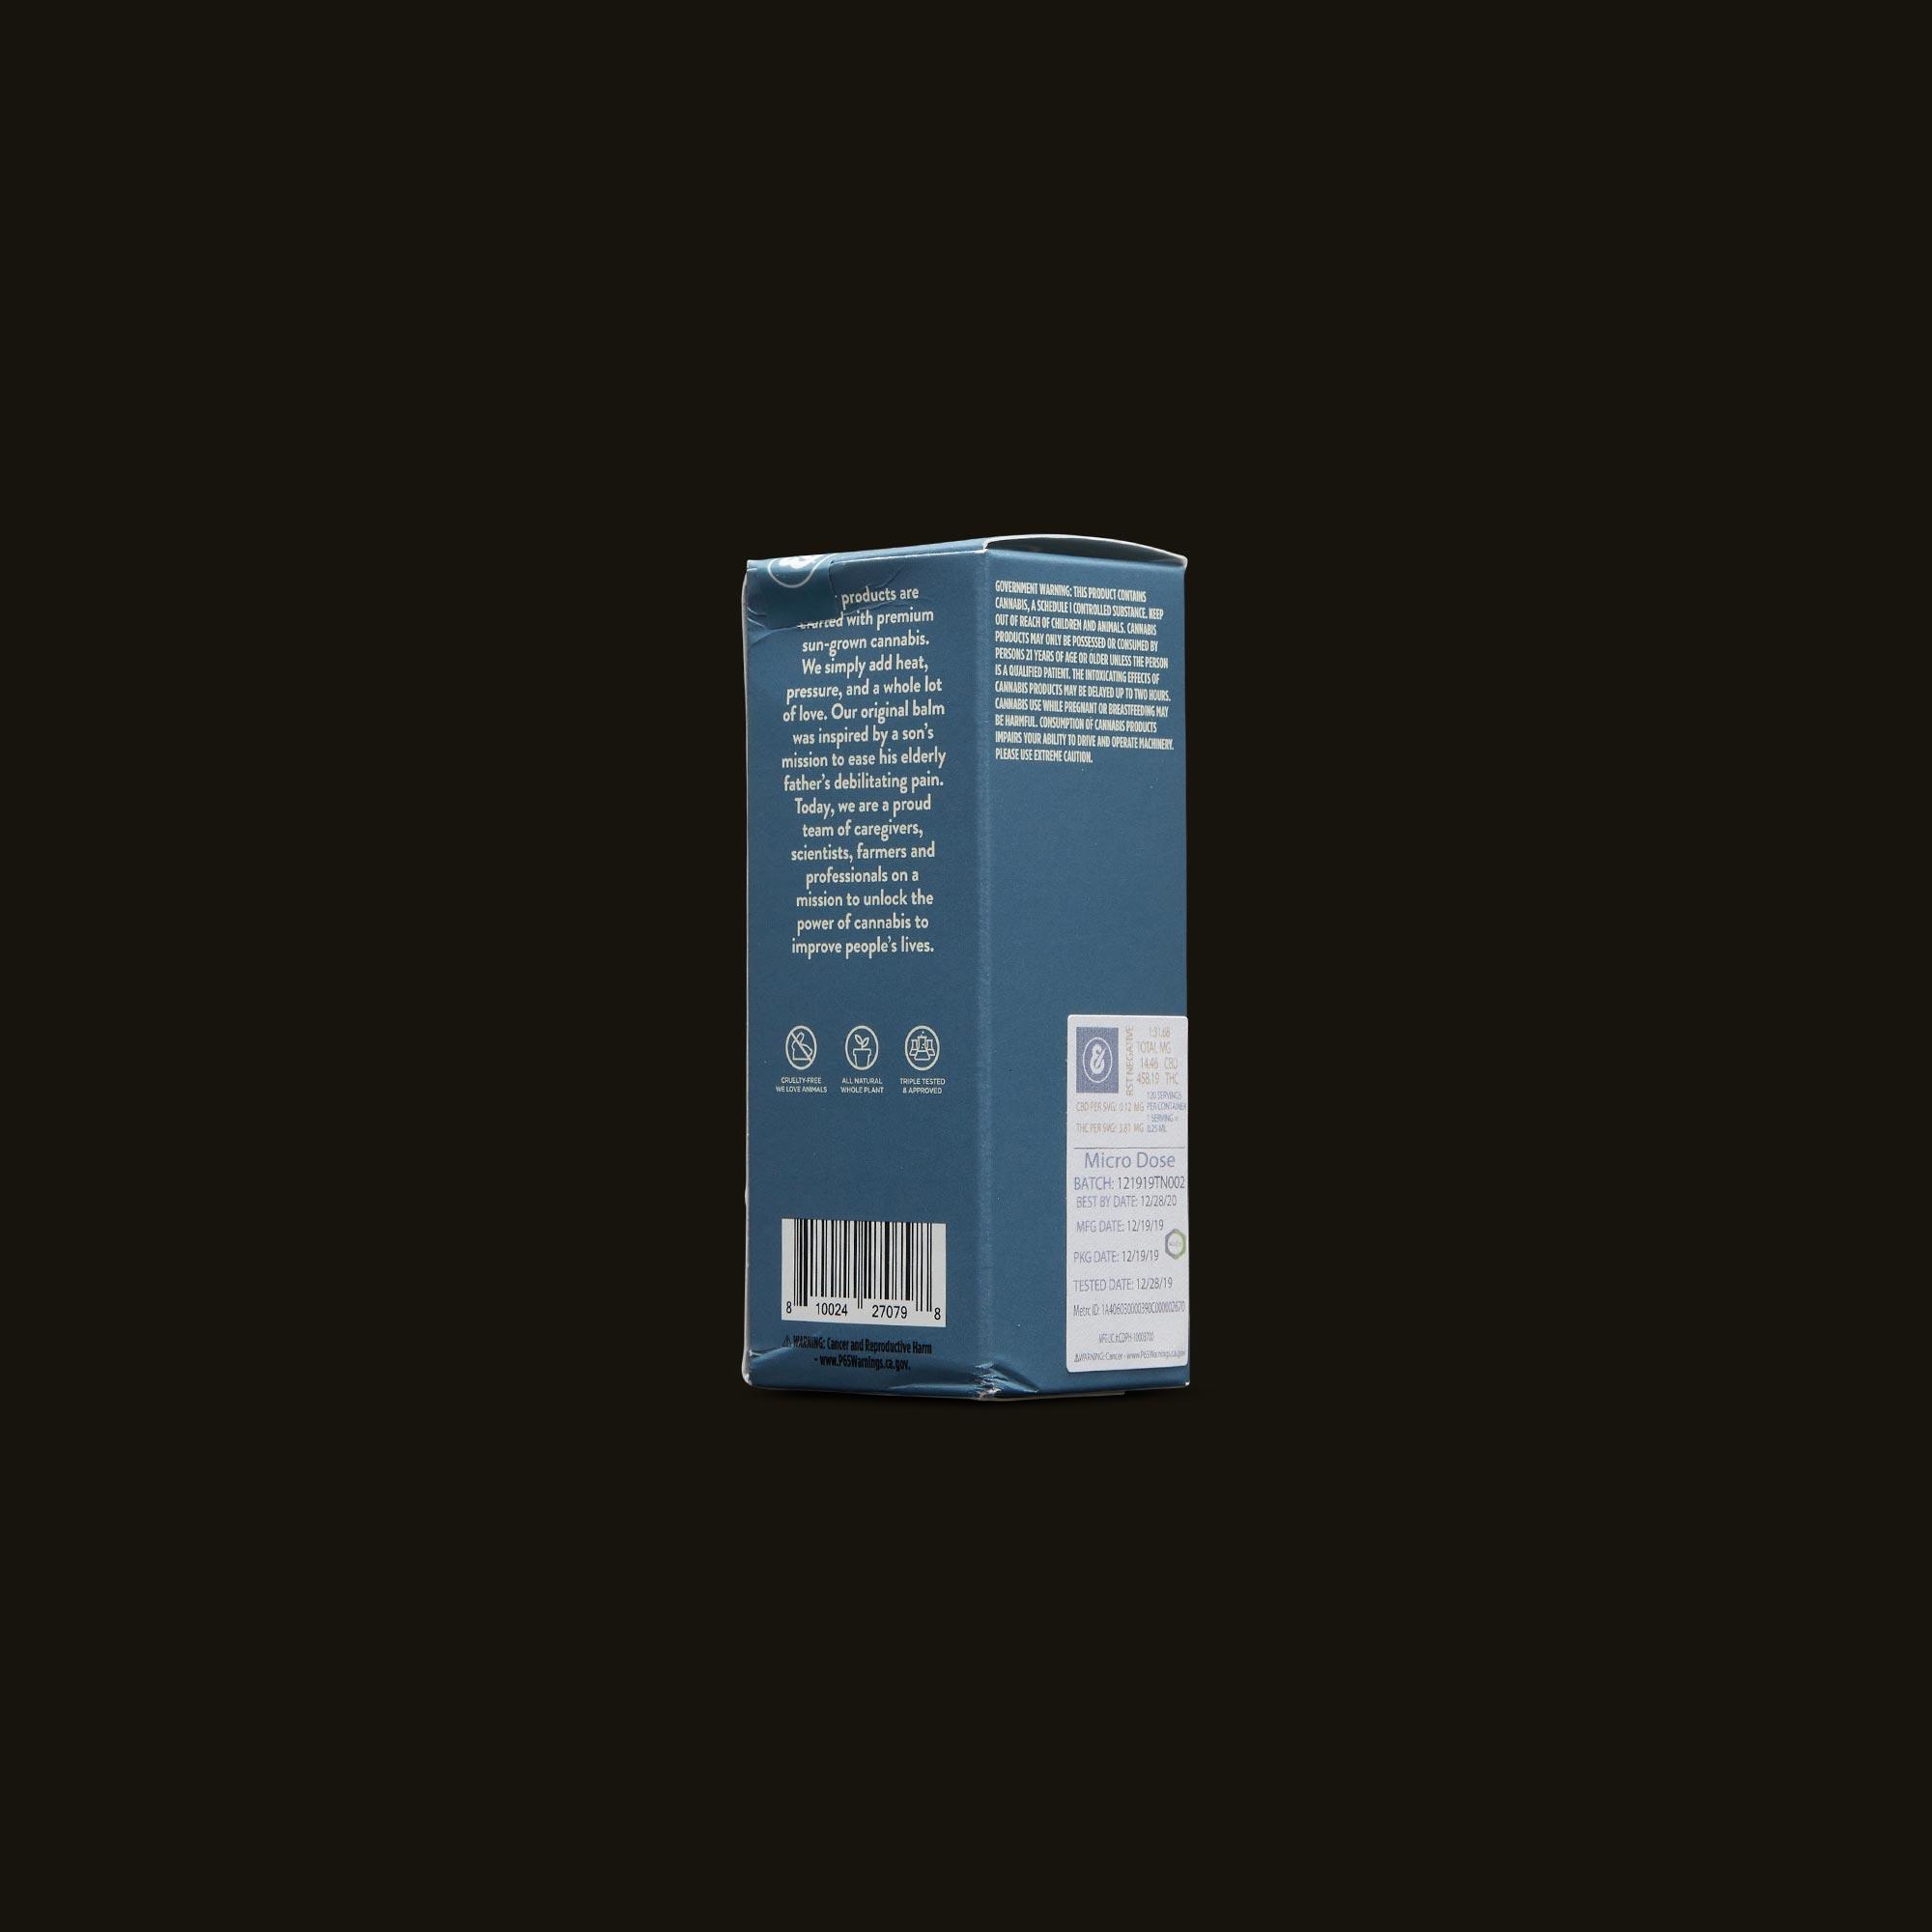 Papa & Barkley 1:30 CBD:THC Releaf Microdose